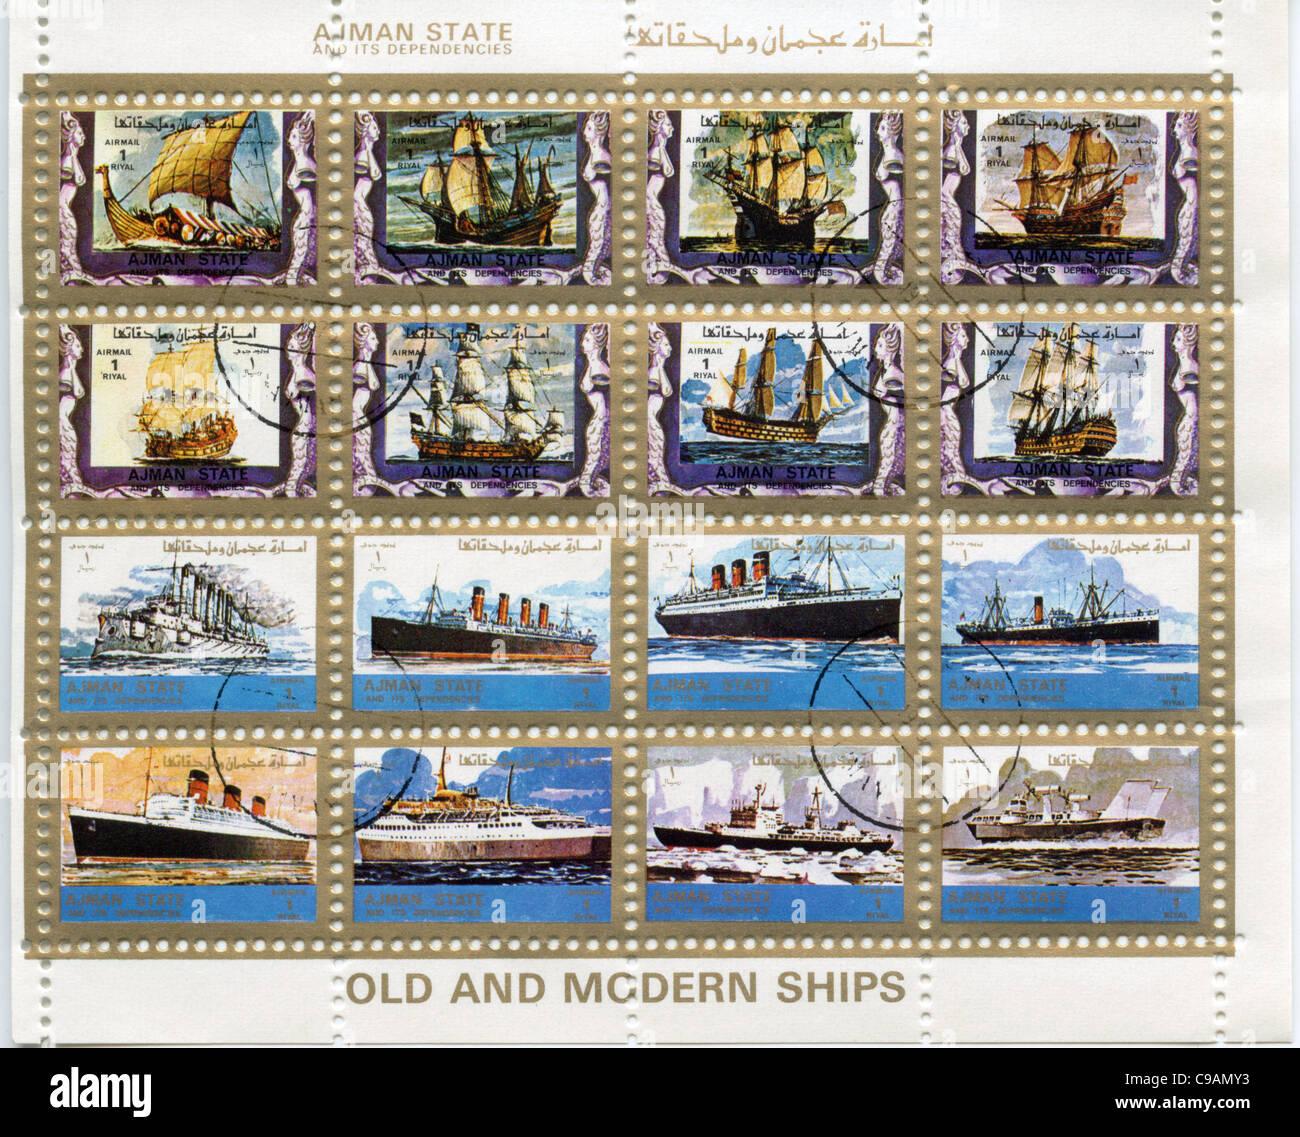 Ajman State postage stamps - Stock Image